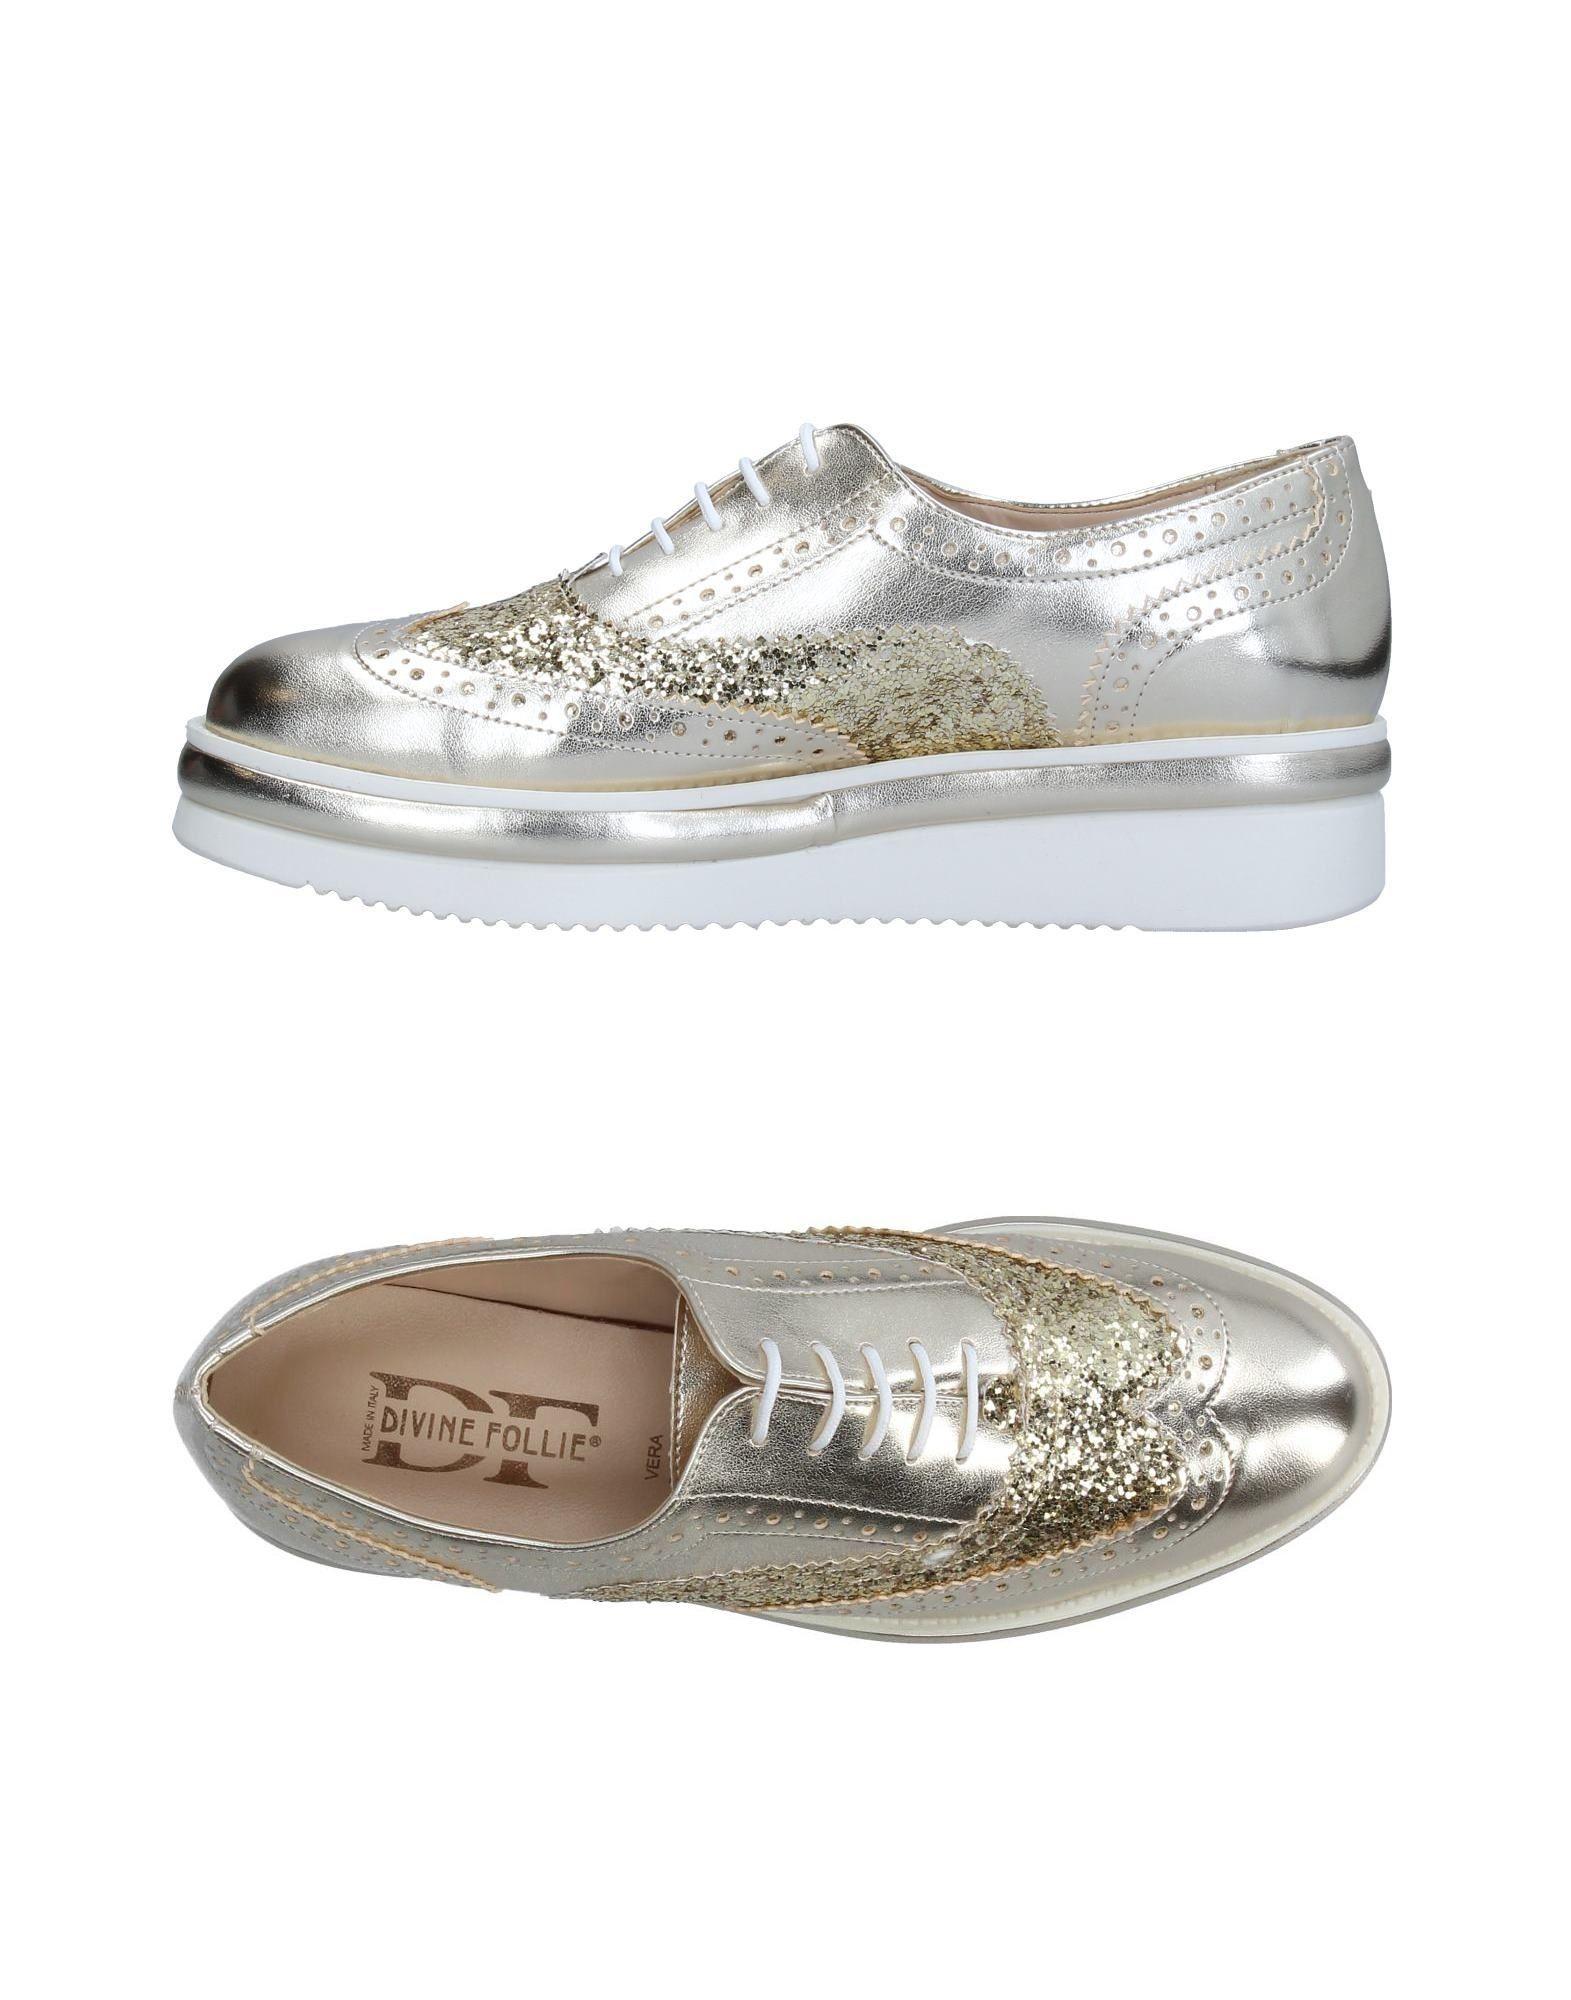 Divine Follie Schnürschuhe Damen  11332740PE Gute Qualität beliebte Schuhe